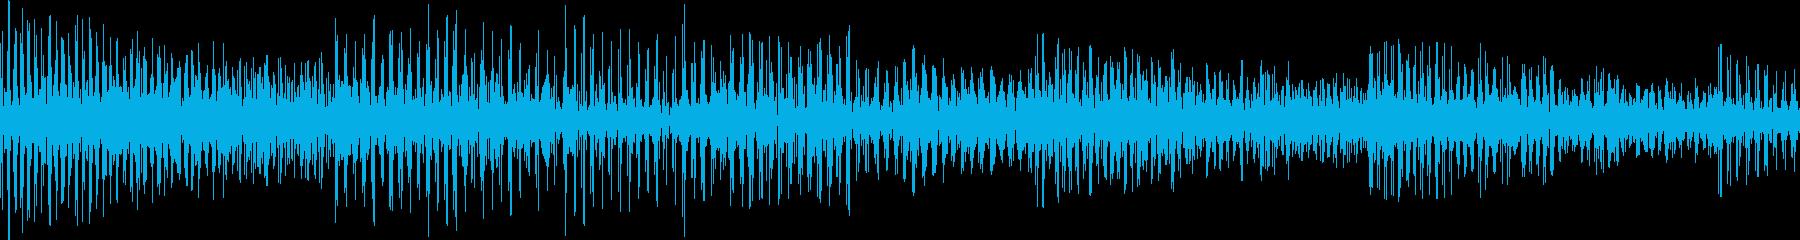 AMGアナログFX10の再生済みの波形